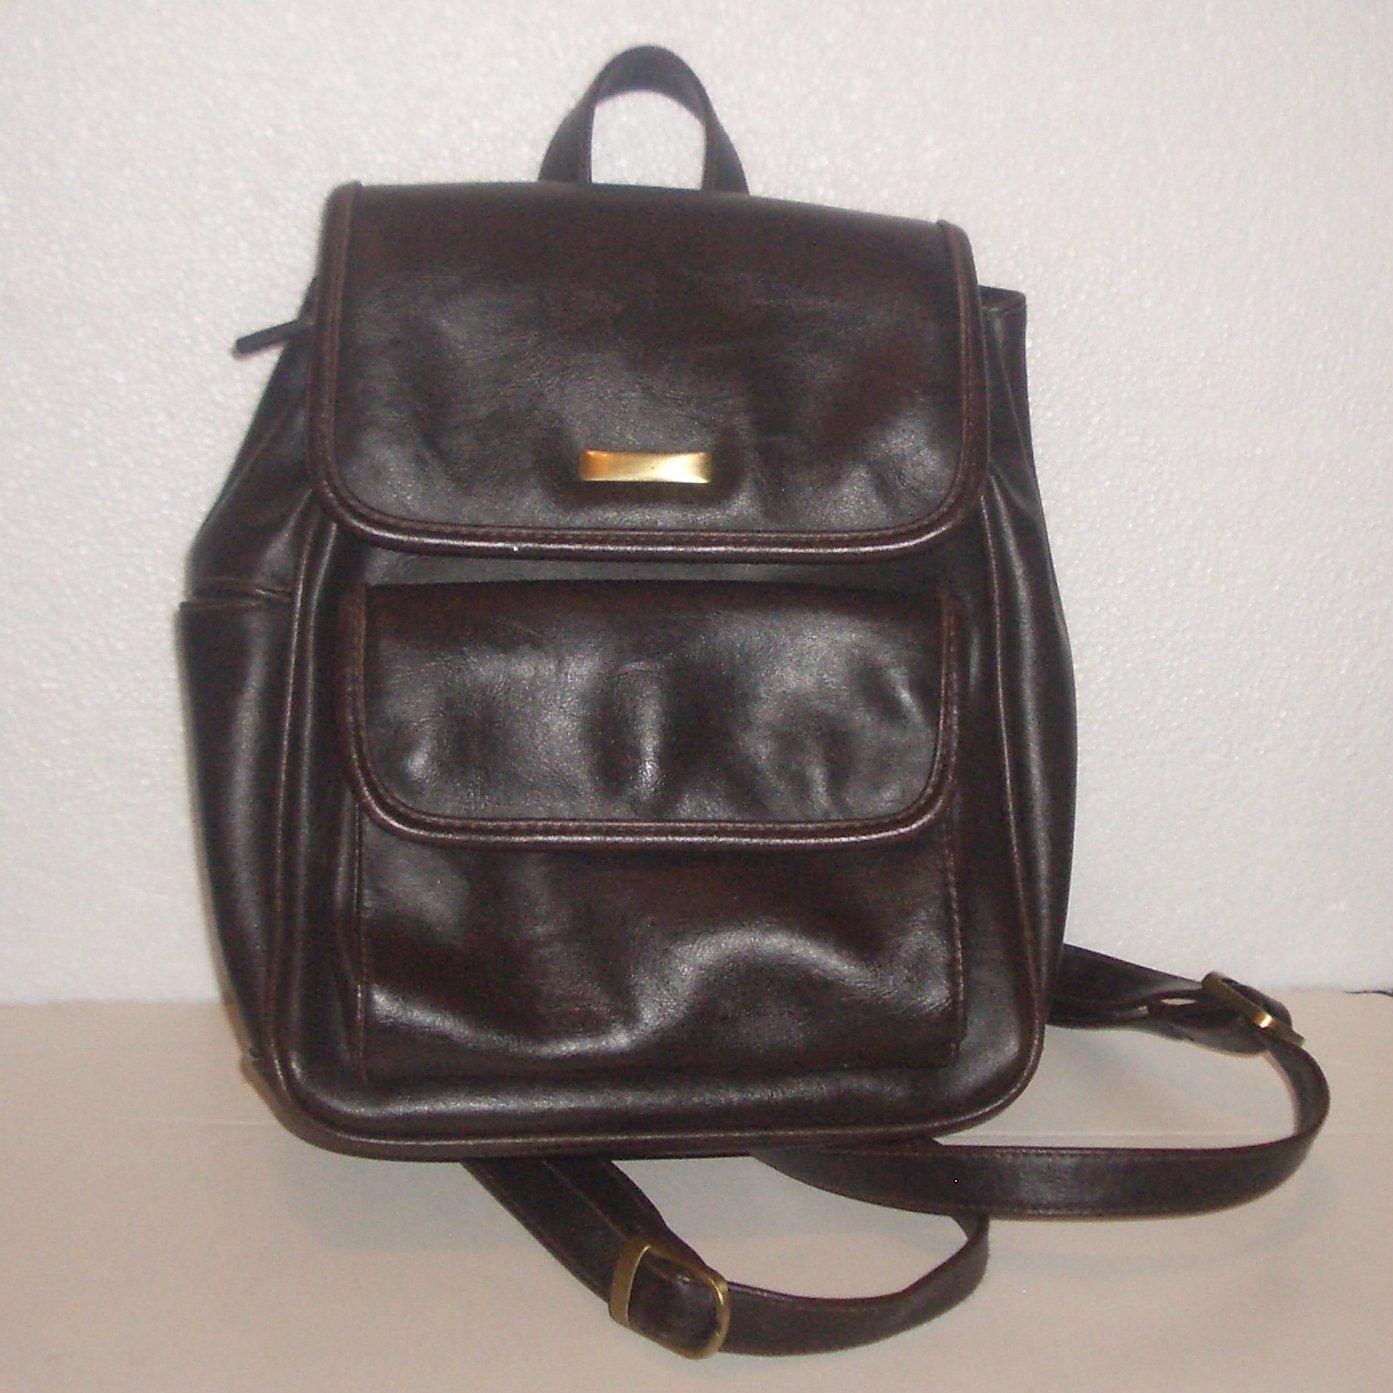 Leather Mini Backpack Satchel Dark Brown Handbag Zipper Closure Adjustable